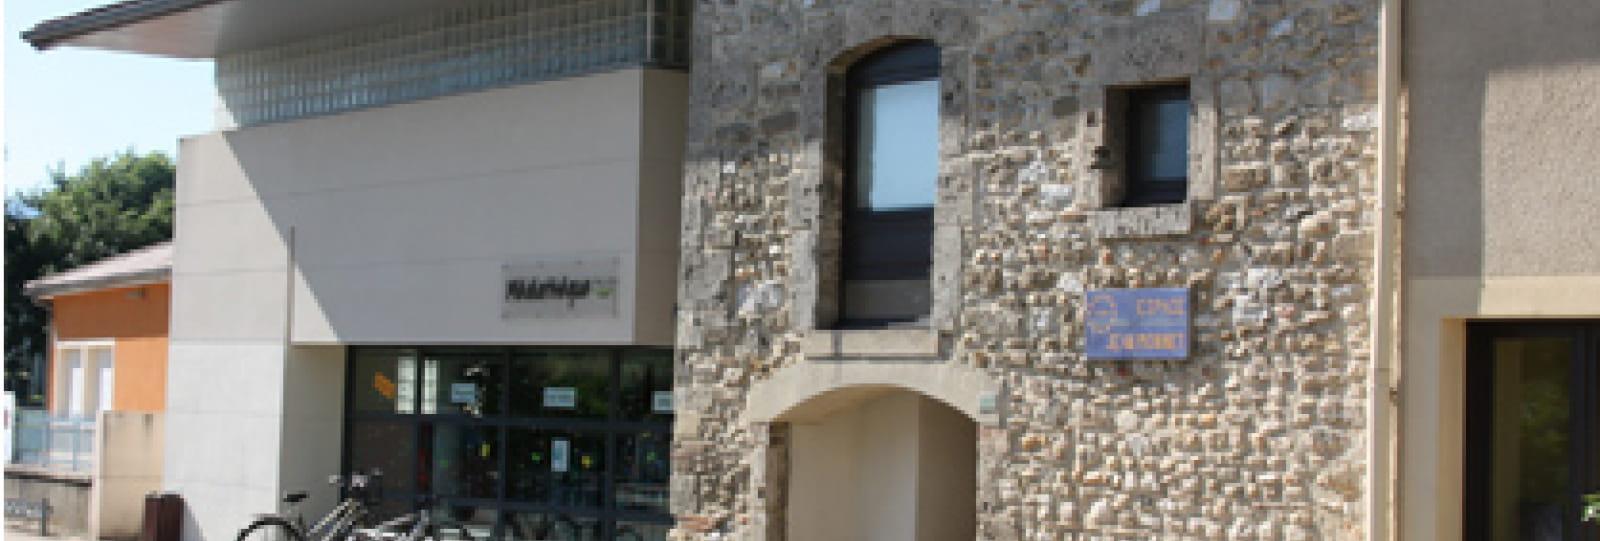 Salle Jean Giono